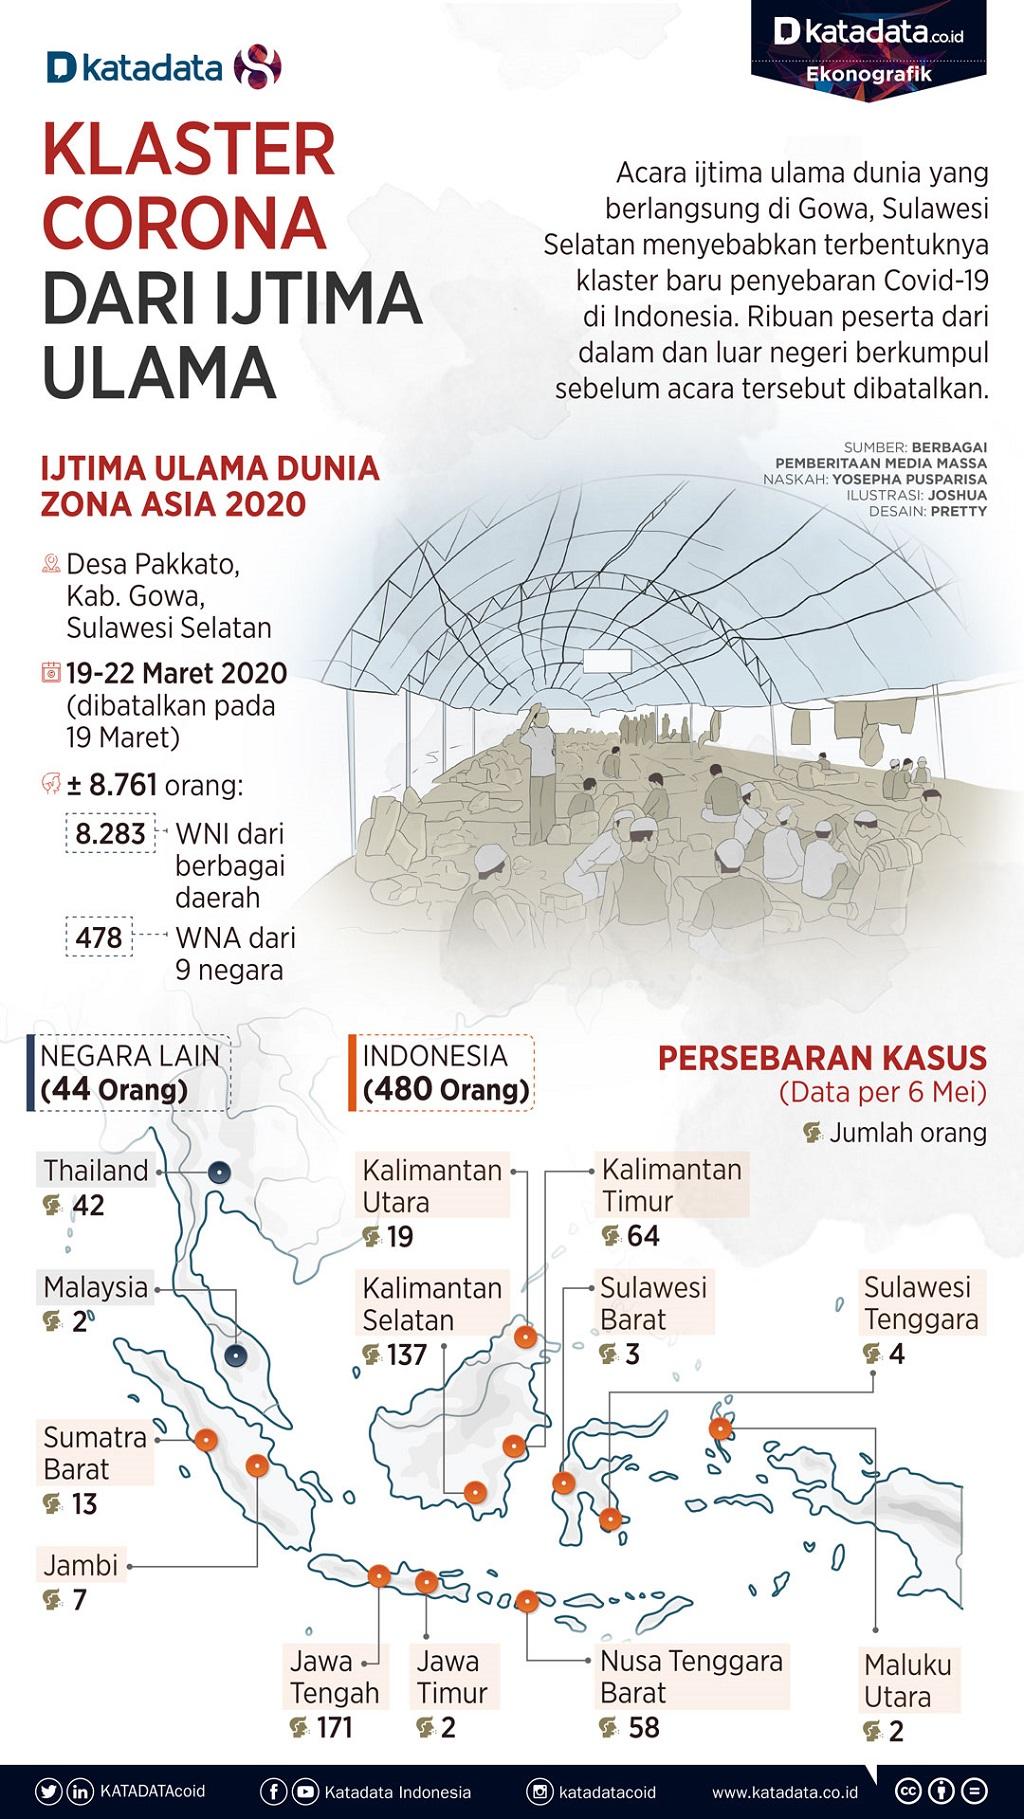 Klaster Ijtima Ulama